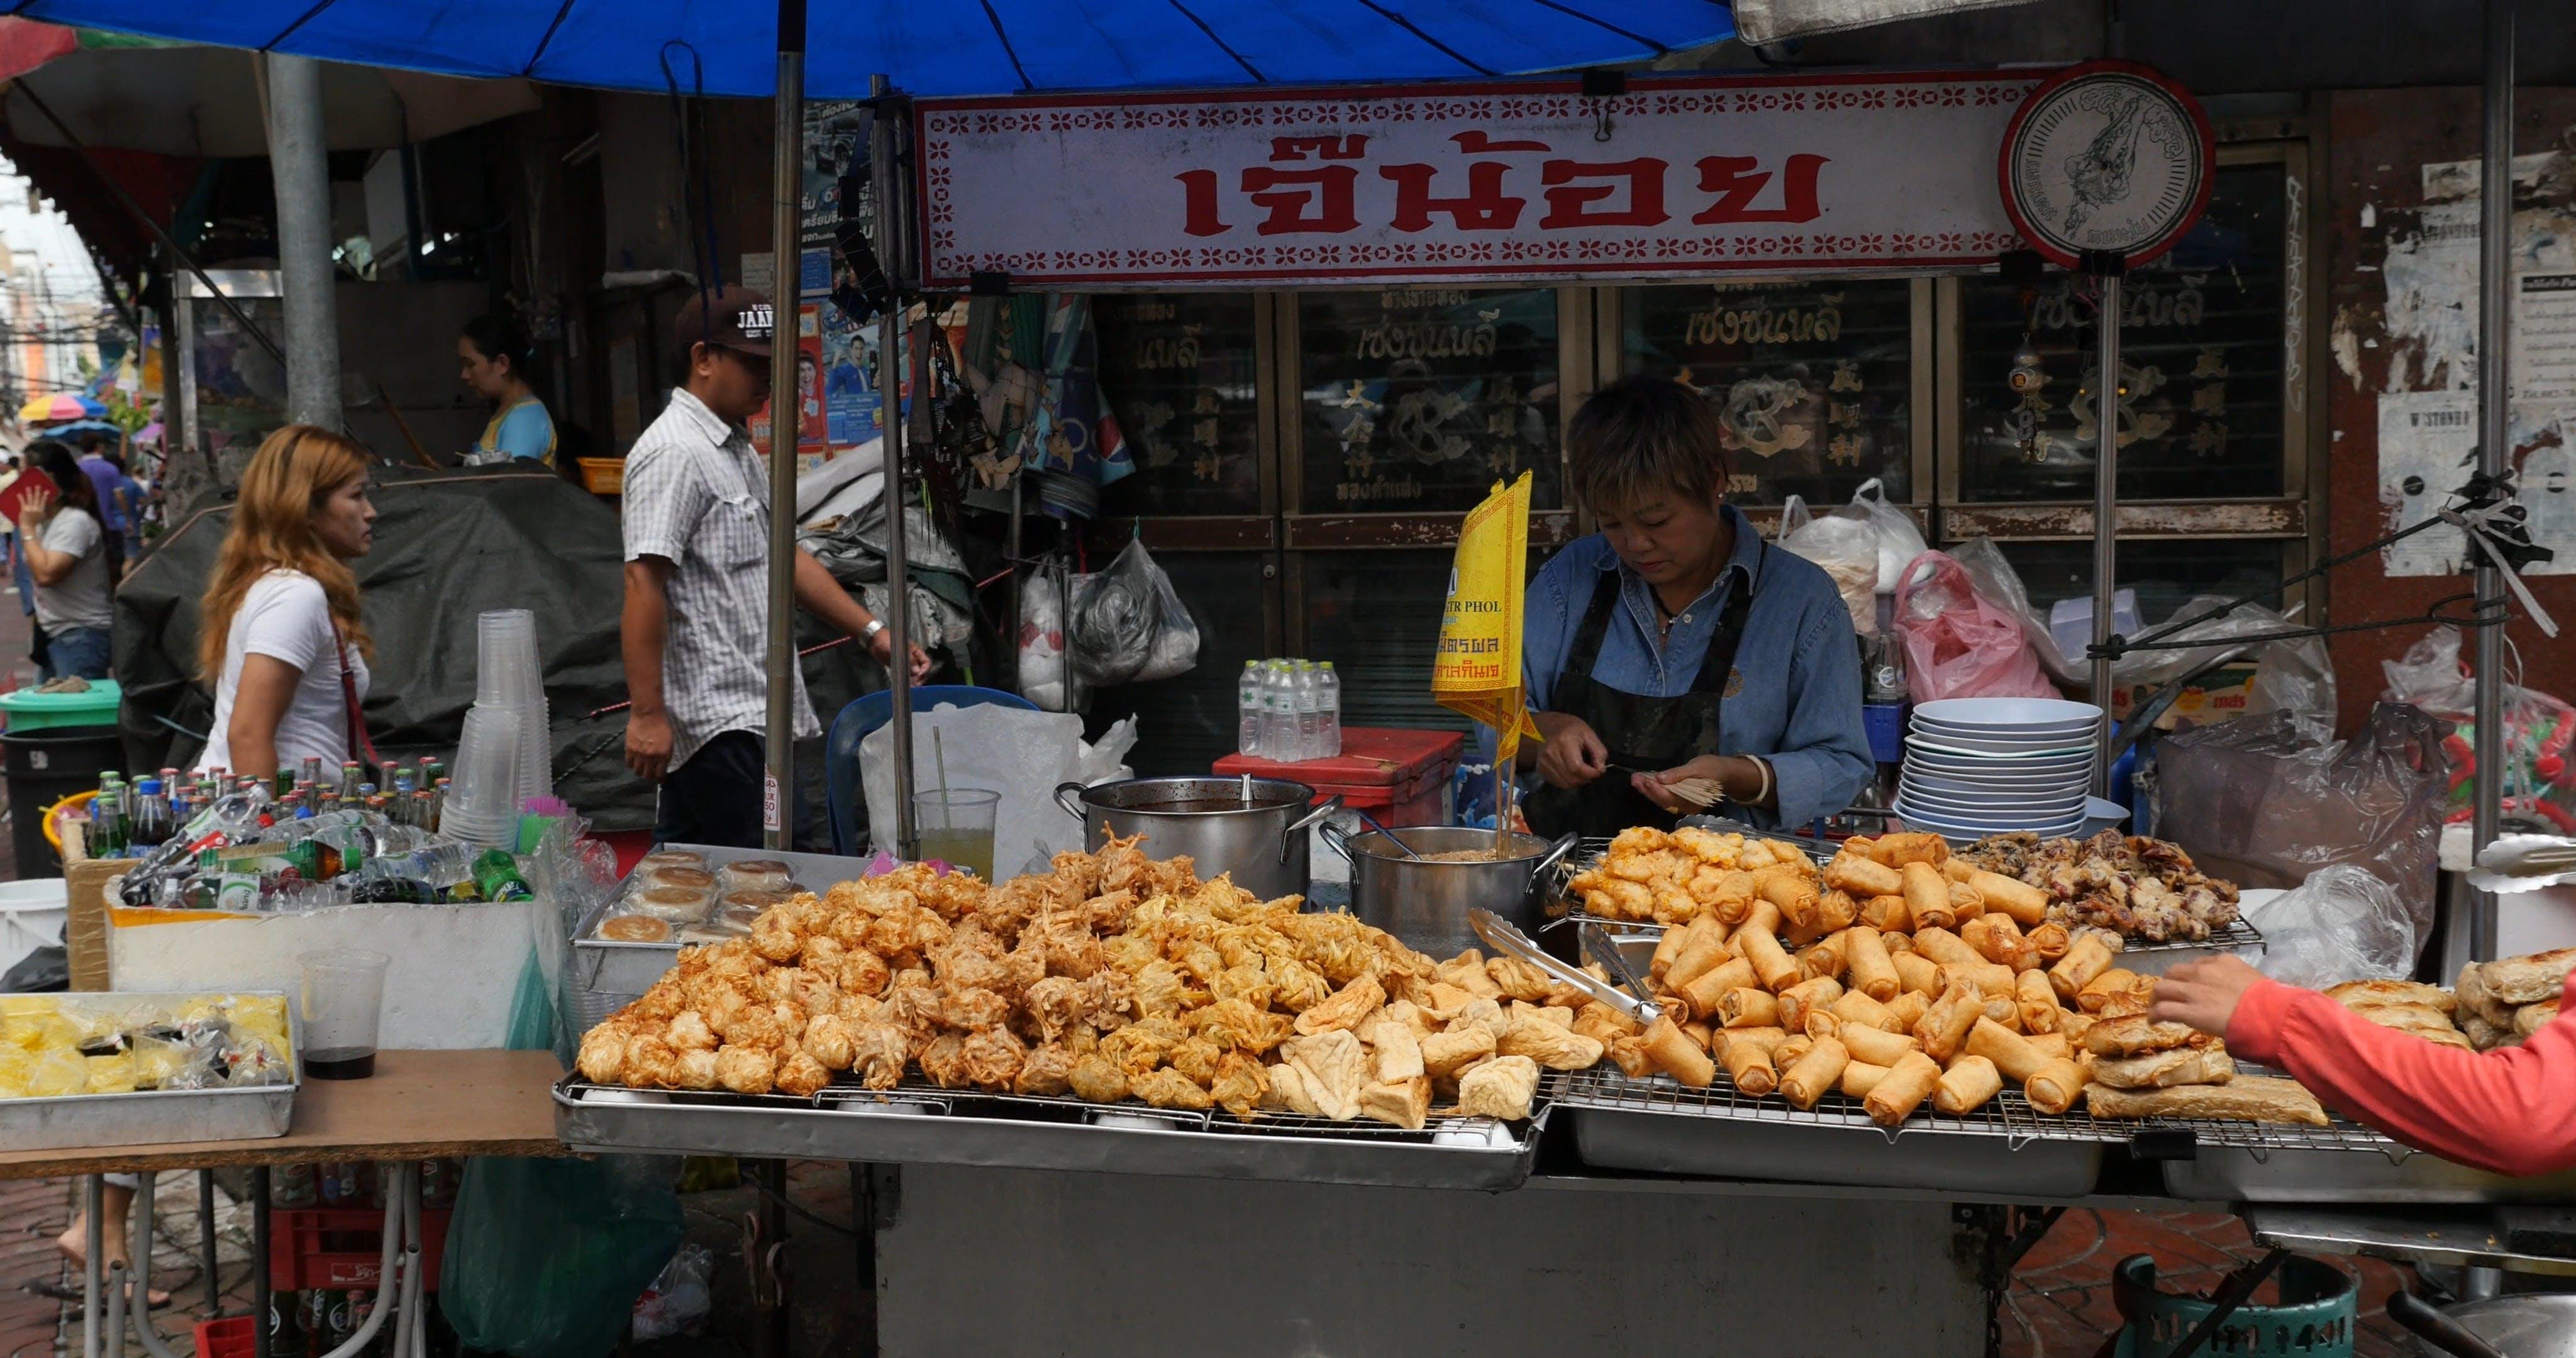 Street Food On A Stall